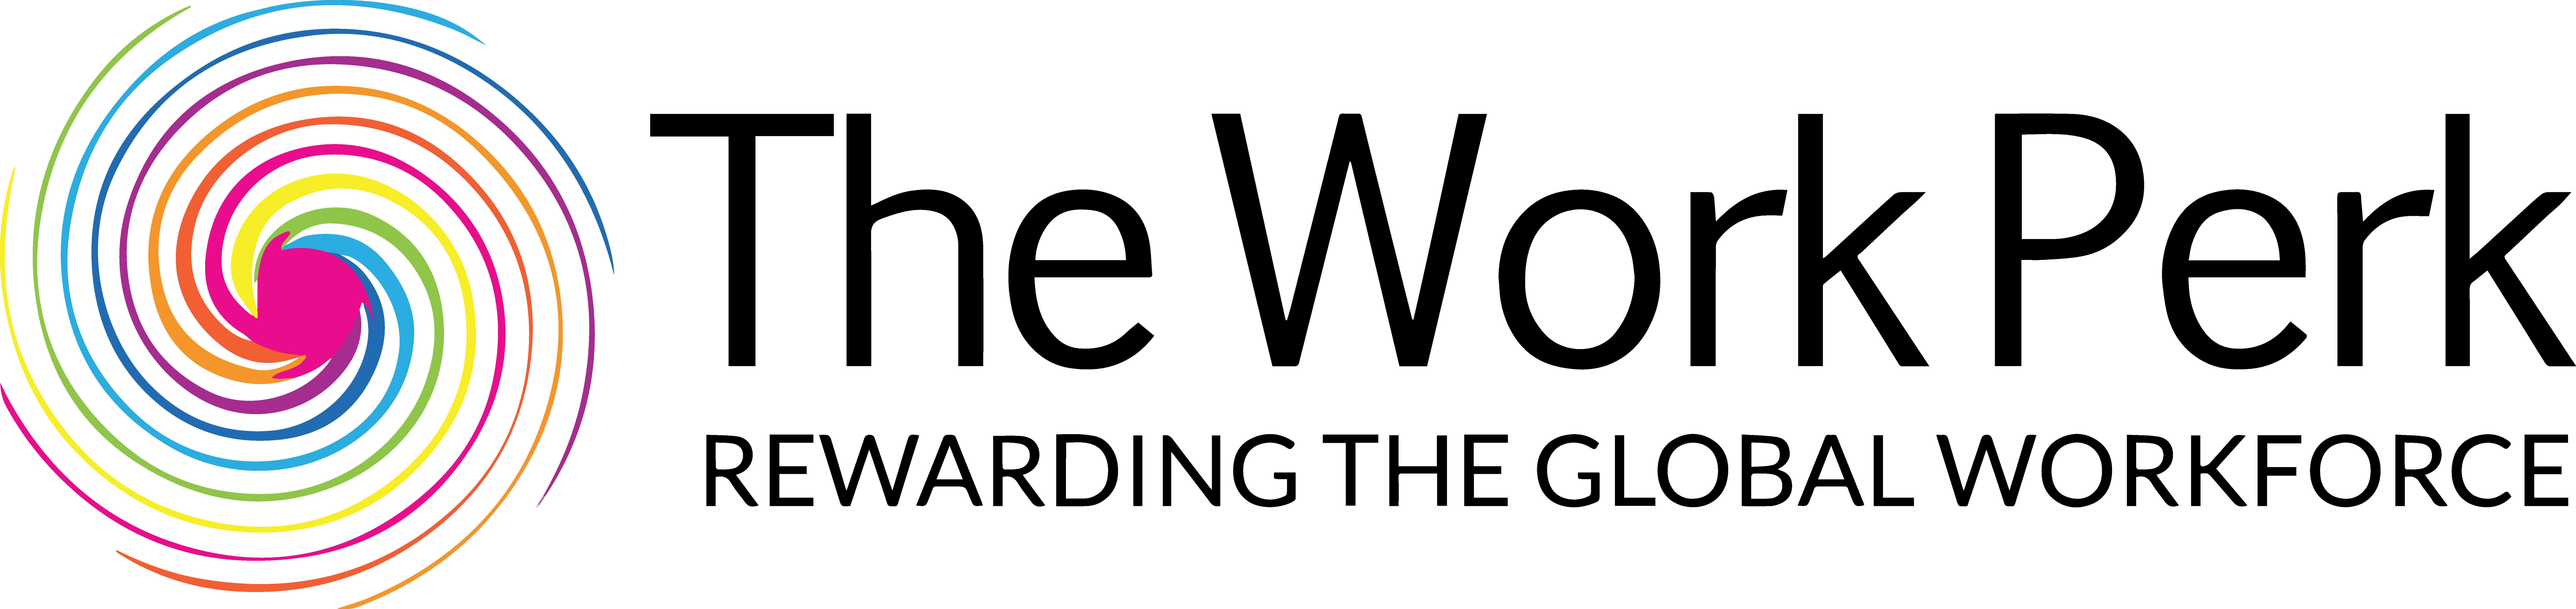 The-Work-Perk-Logo-BLACK-Transparent